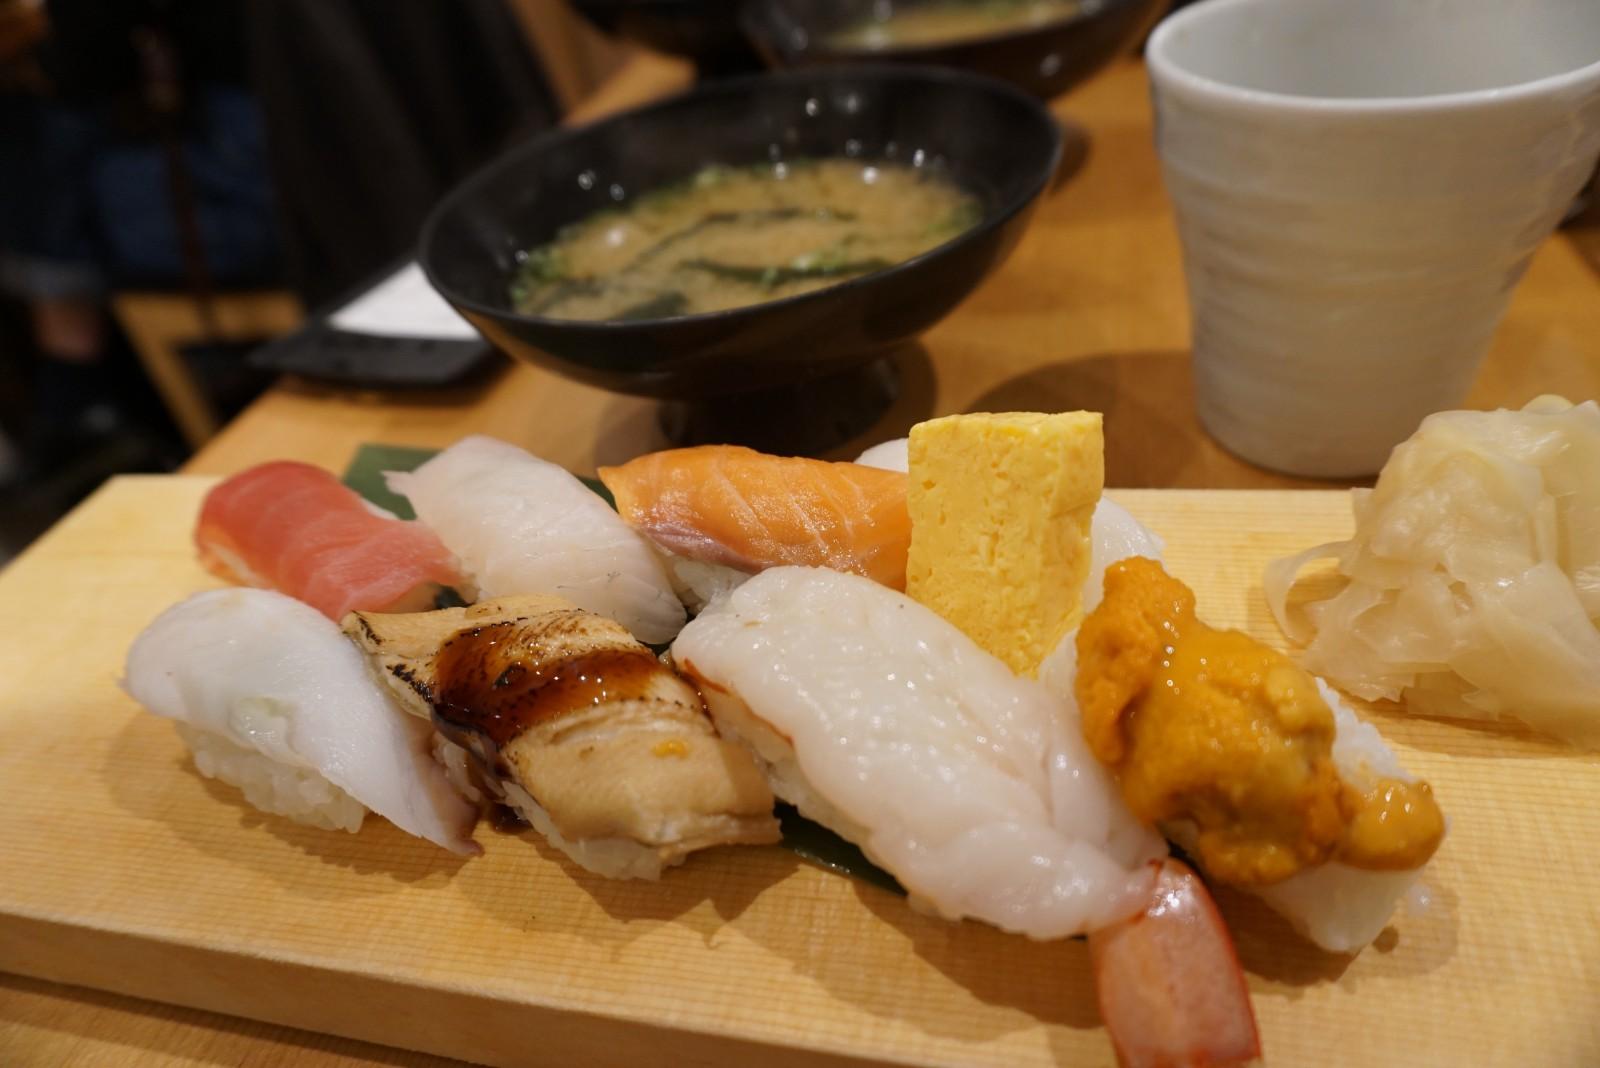 Sushi at Harenohi Shokudo, Tsukiji Fish Market